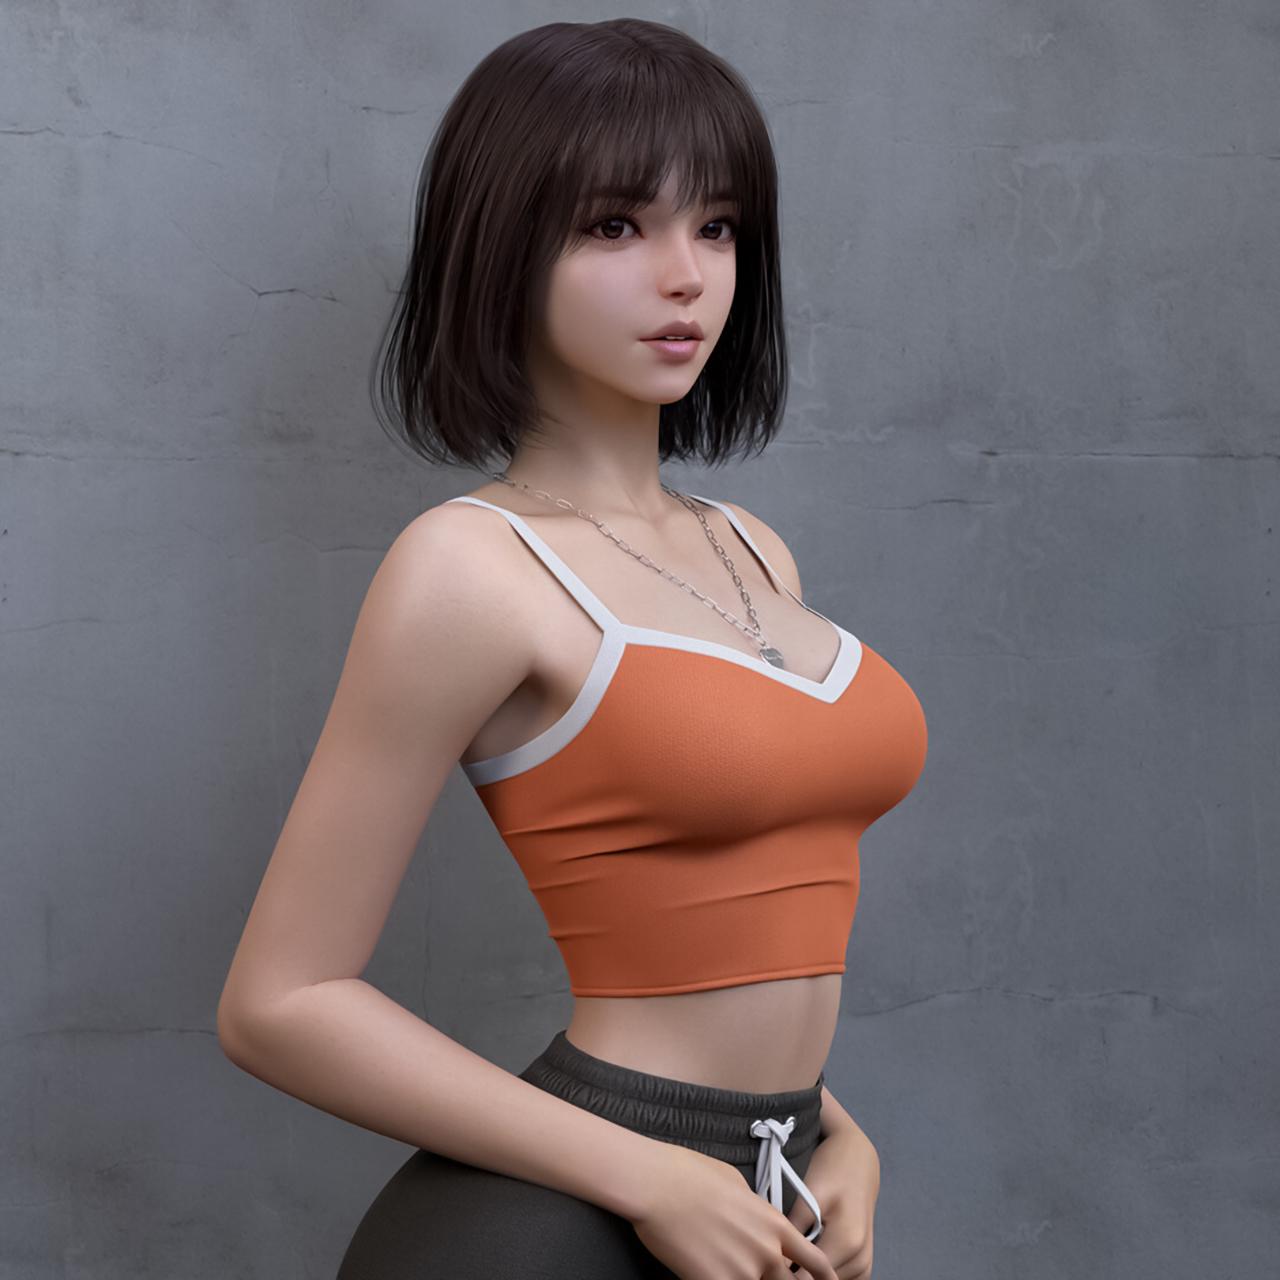 General 1280x1280 Shin JeongHo CGI women brunette shoulder length hair bangs straight hair tank top orange clothing necklace pants sportswear gray